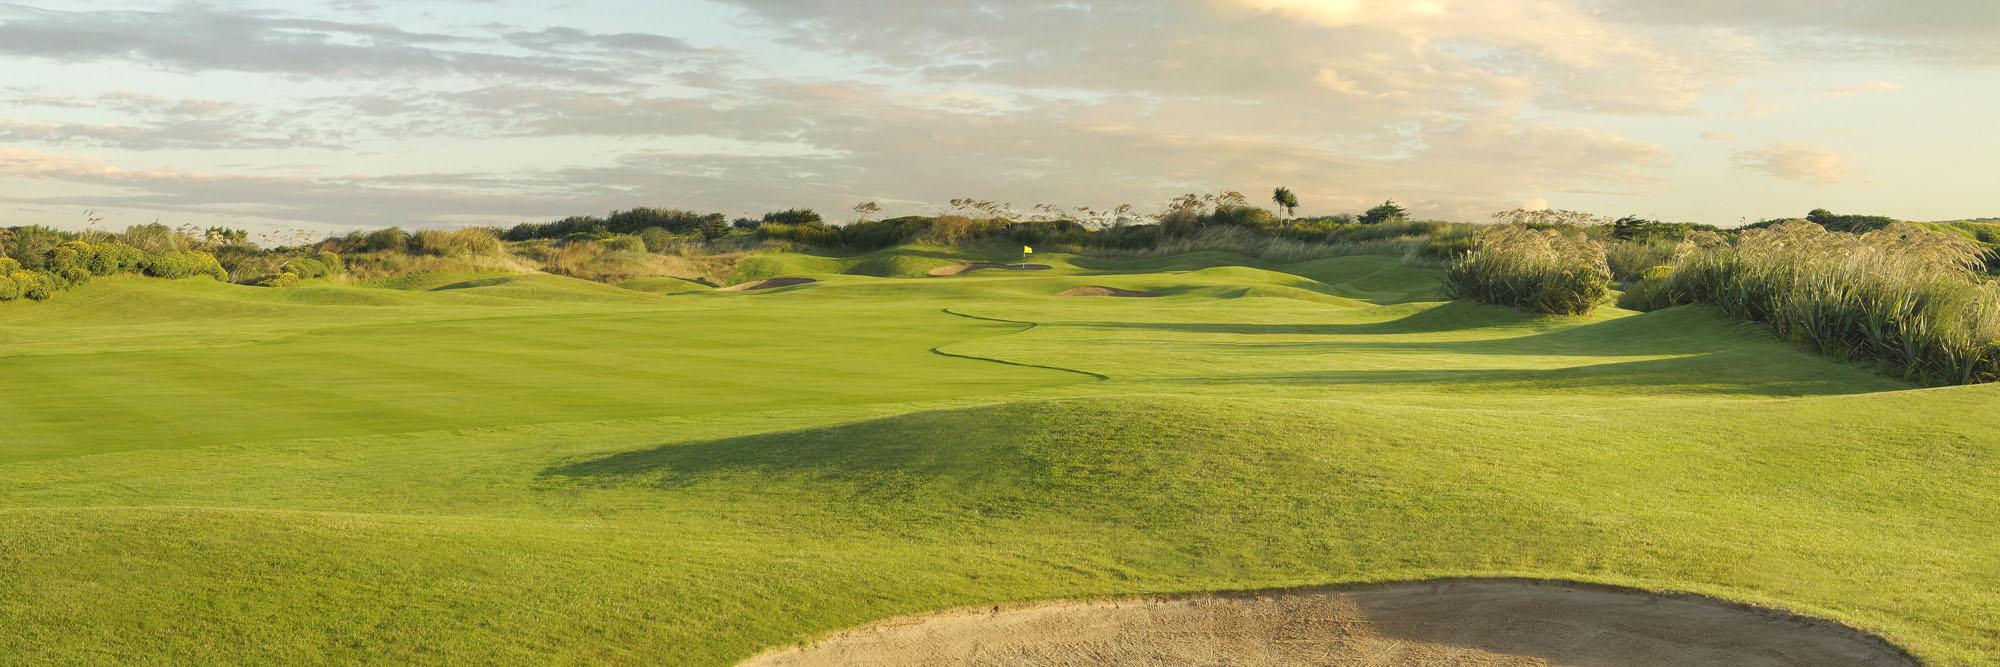 Golf Course Image - Old Head No. 1